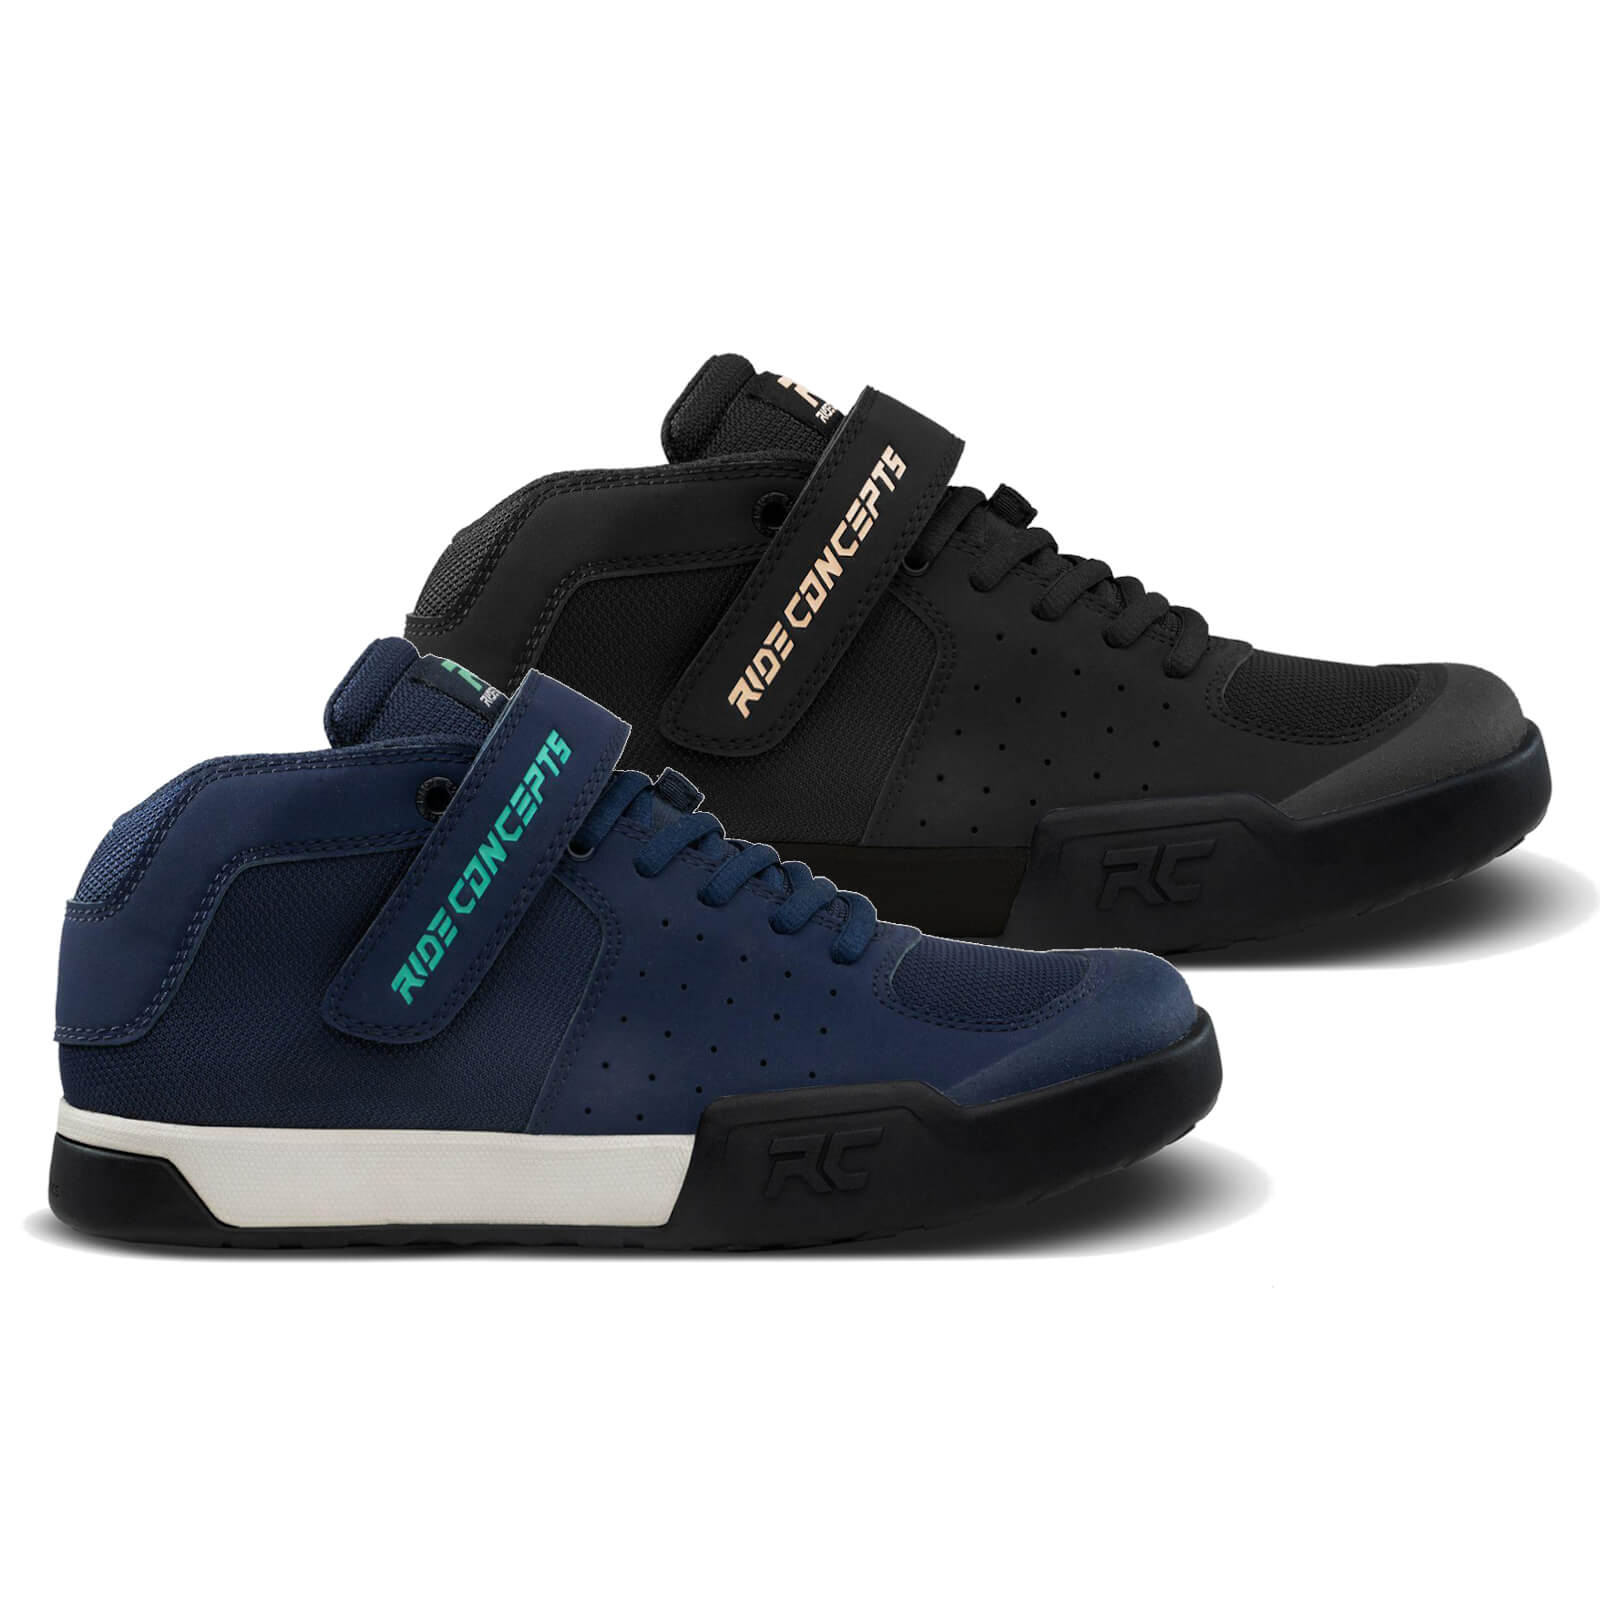 Ride Concepts Women's Wildcat Flat MTB Shoes - UK 5/EU 36 - Navy/Teal